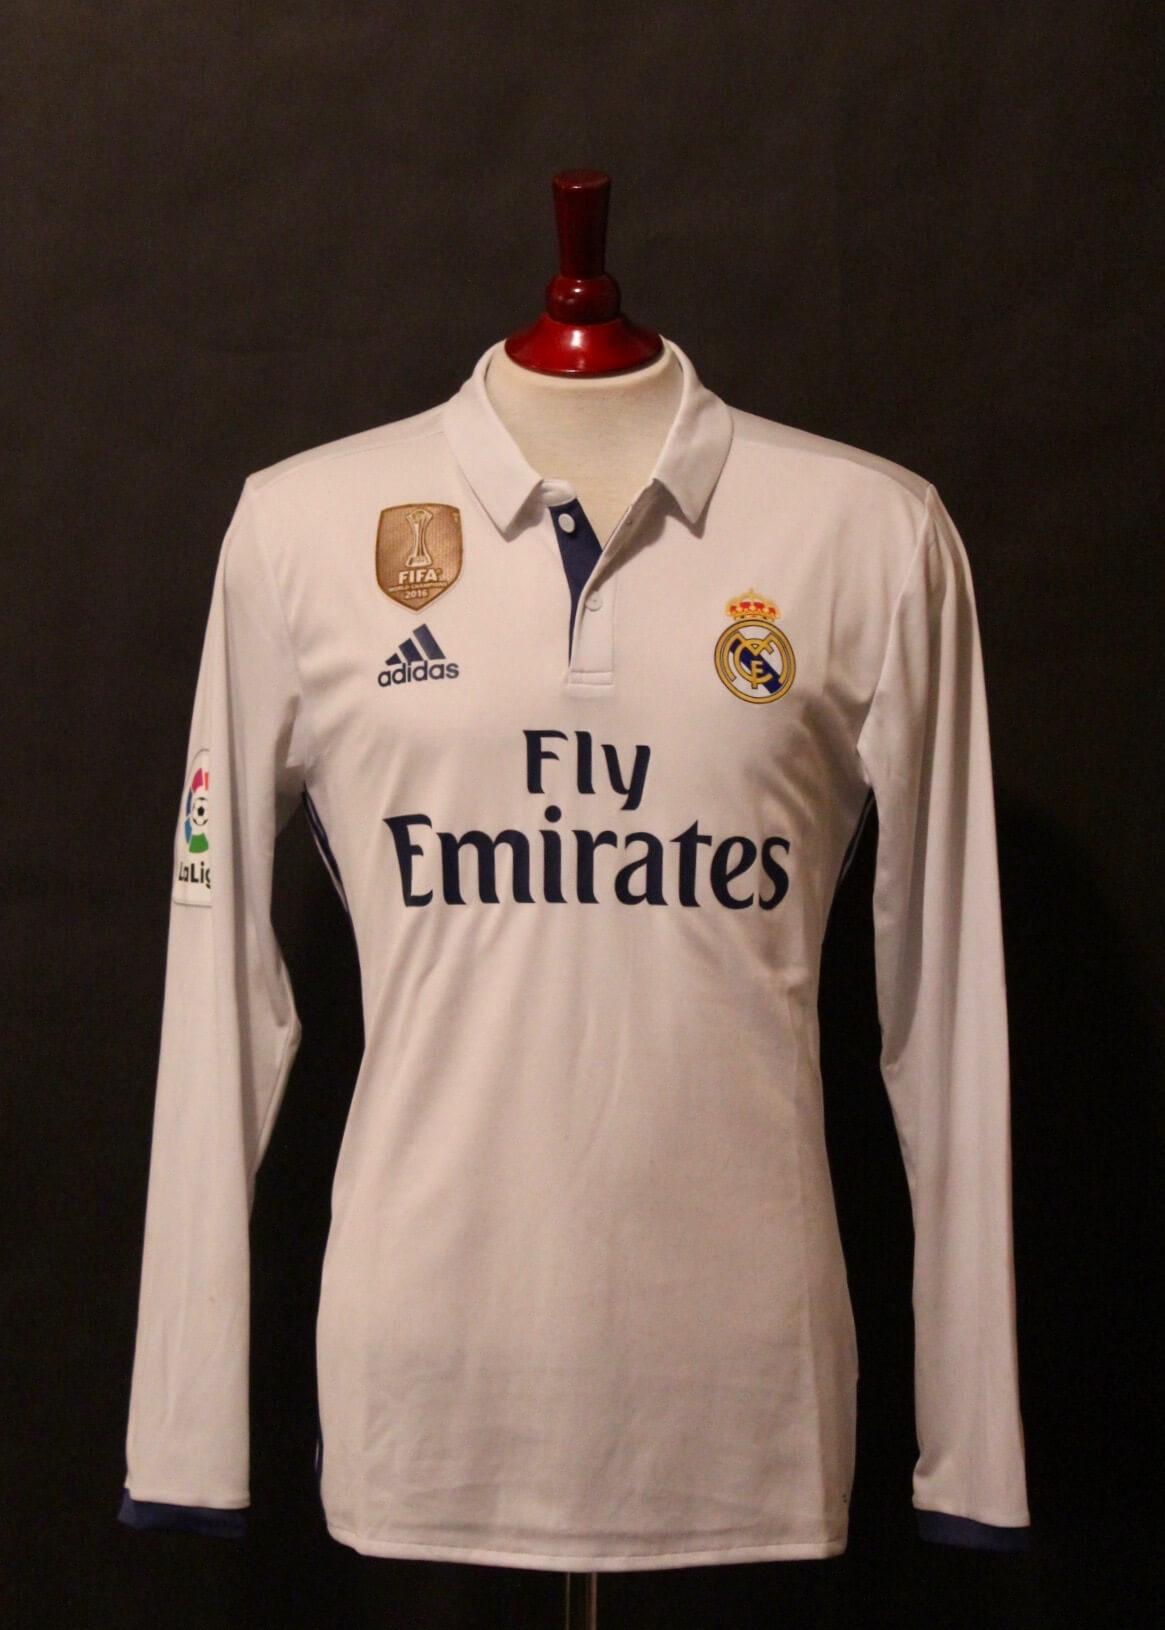 the best attitude 54318 11ae2 Cristiano Ronaldo Game-Used #7 Real Madrid Home Shirt. 2016/17 Spanish La  Liga.